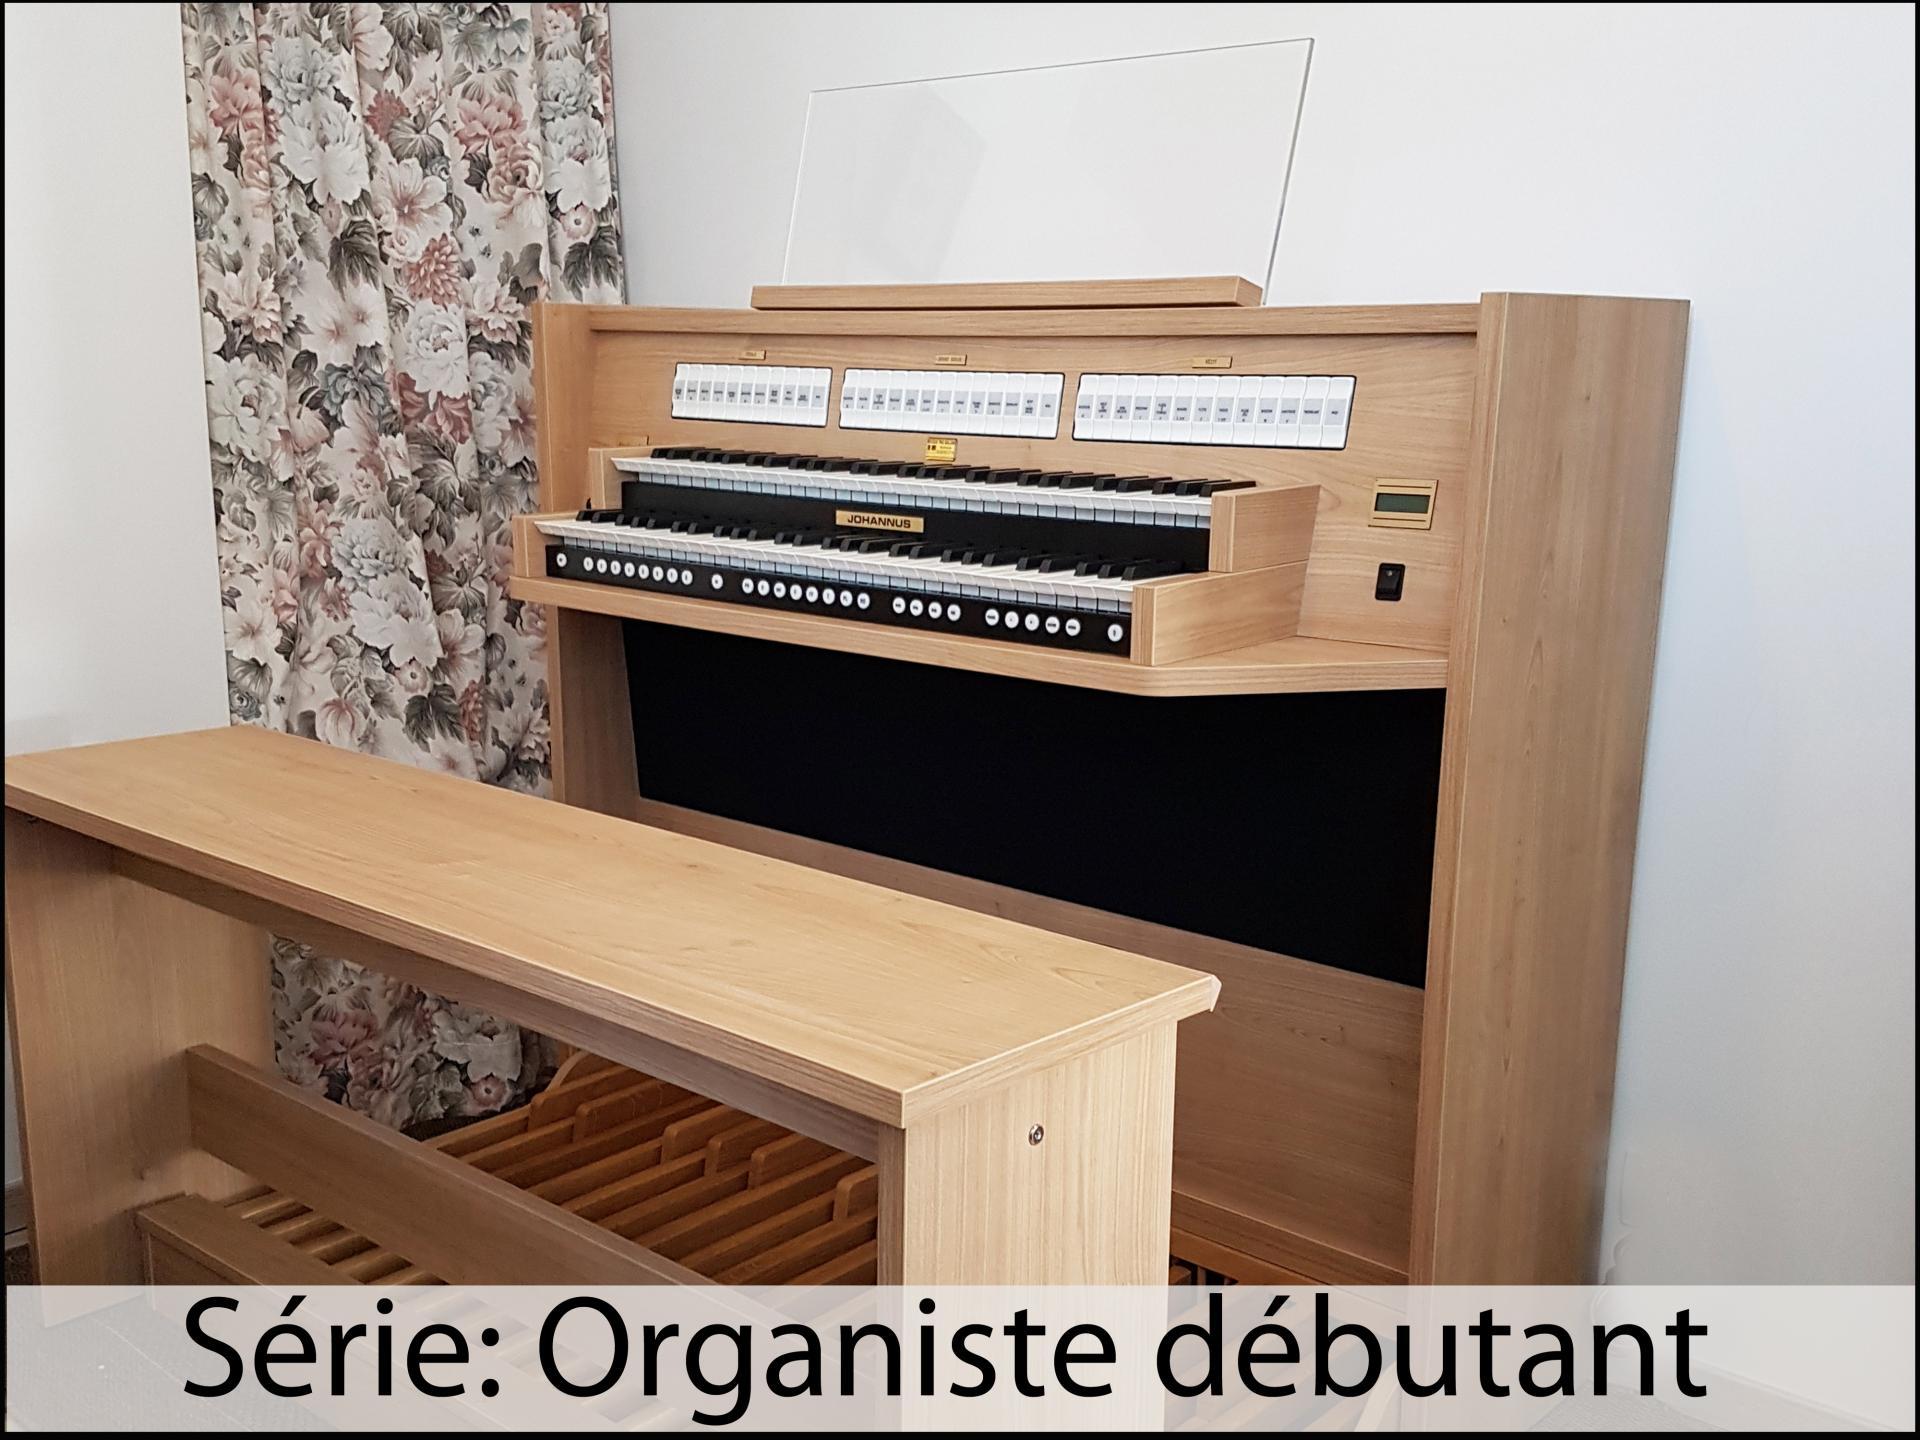 Carre organiste debutant 1